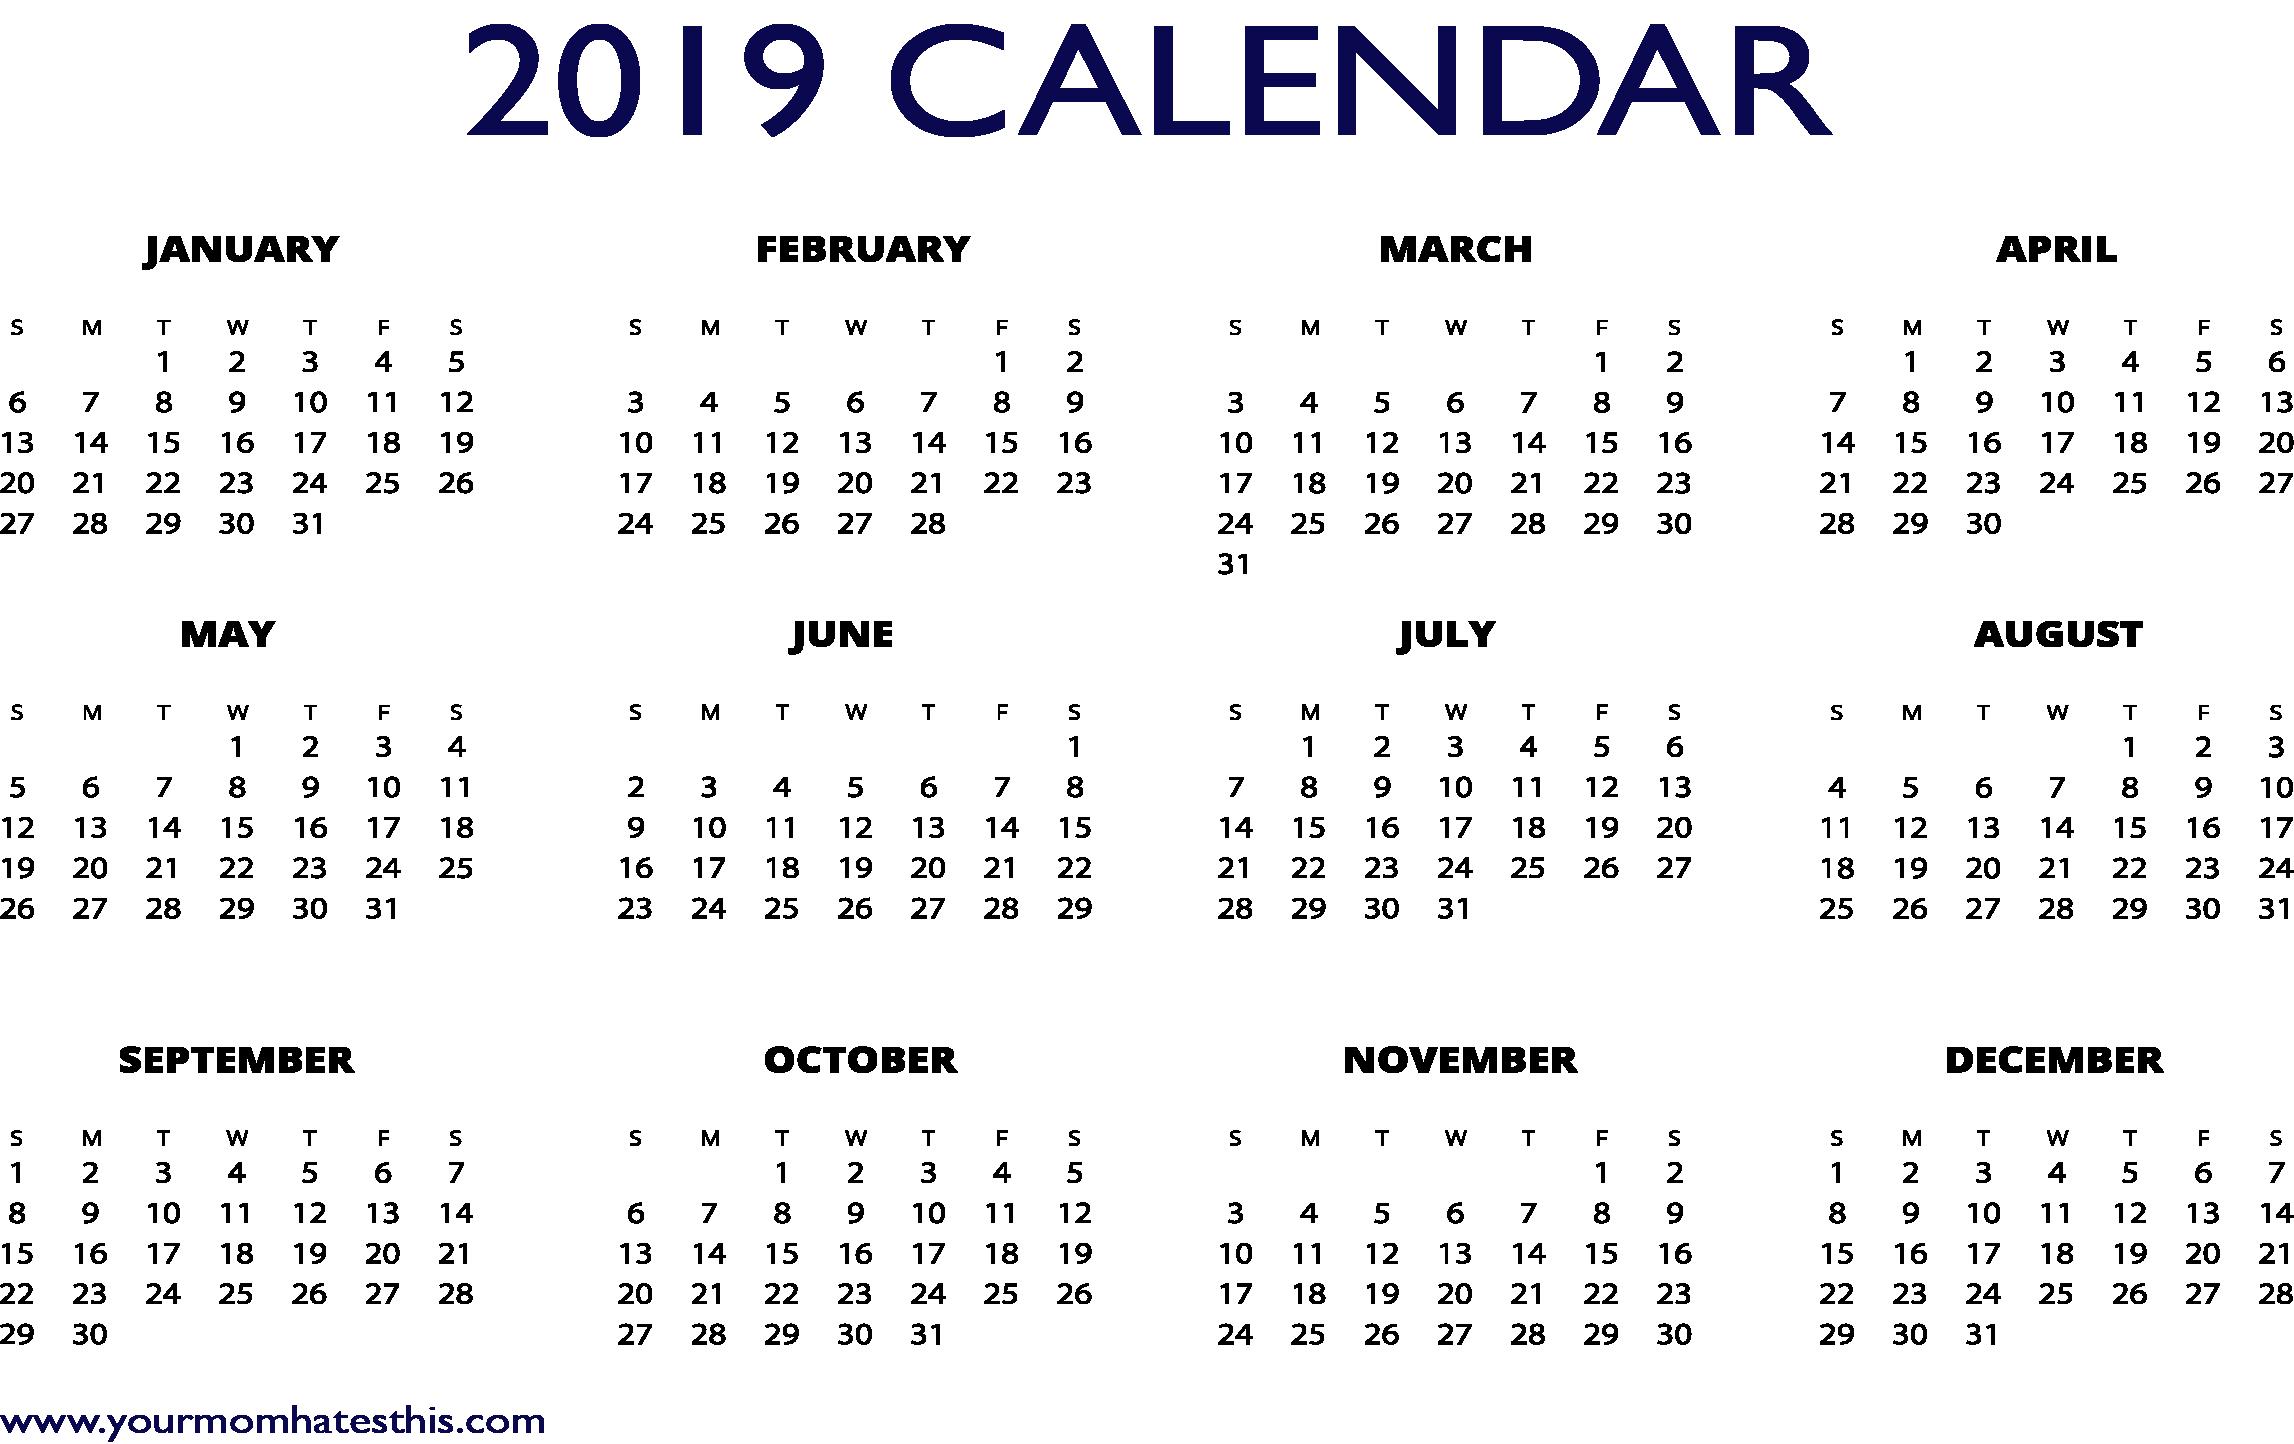 2019 Calendars Download PDF Templates.